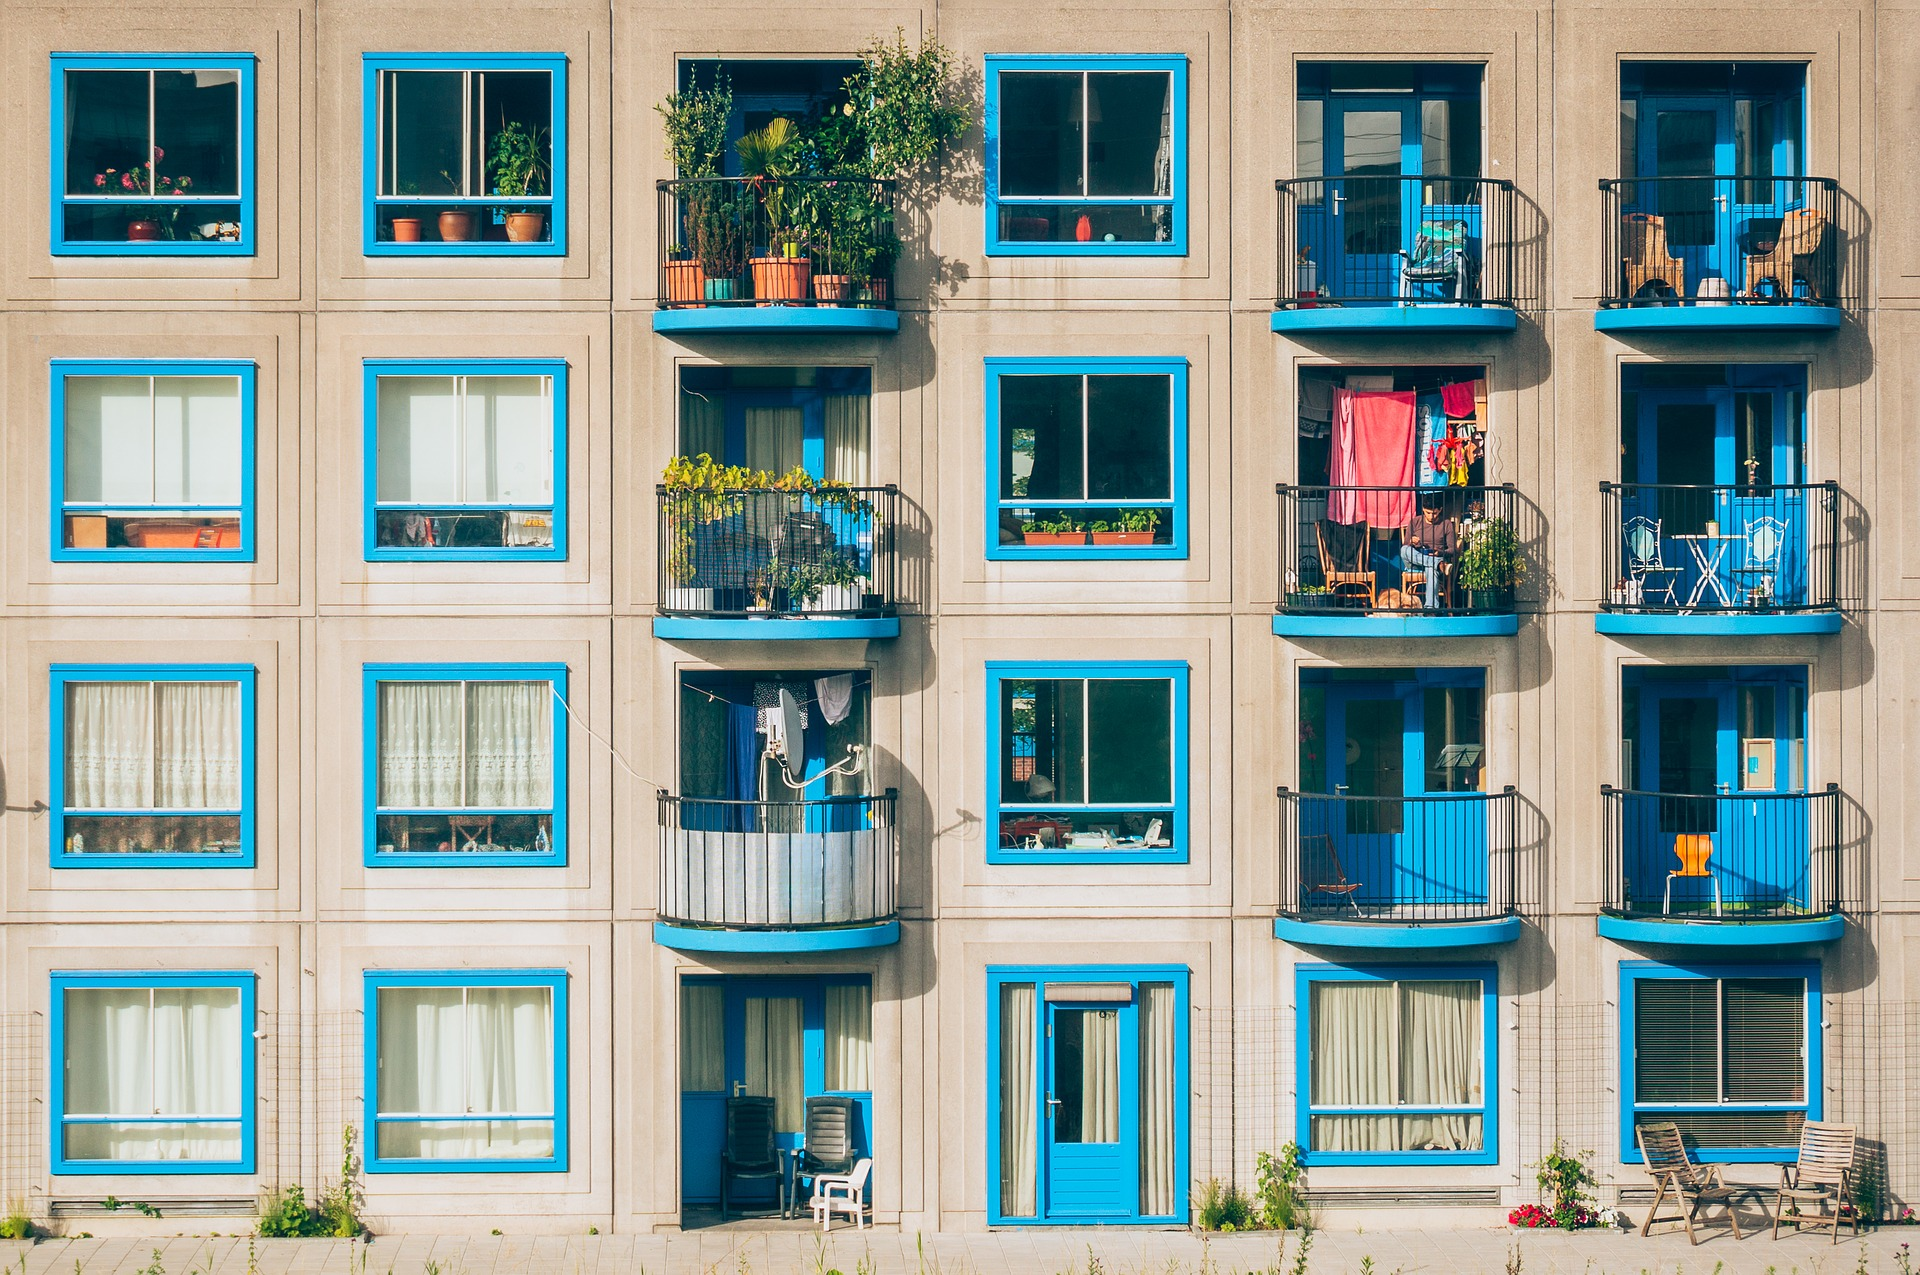 apartments-1845884_1920.jpg